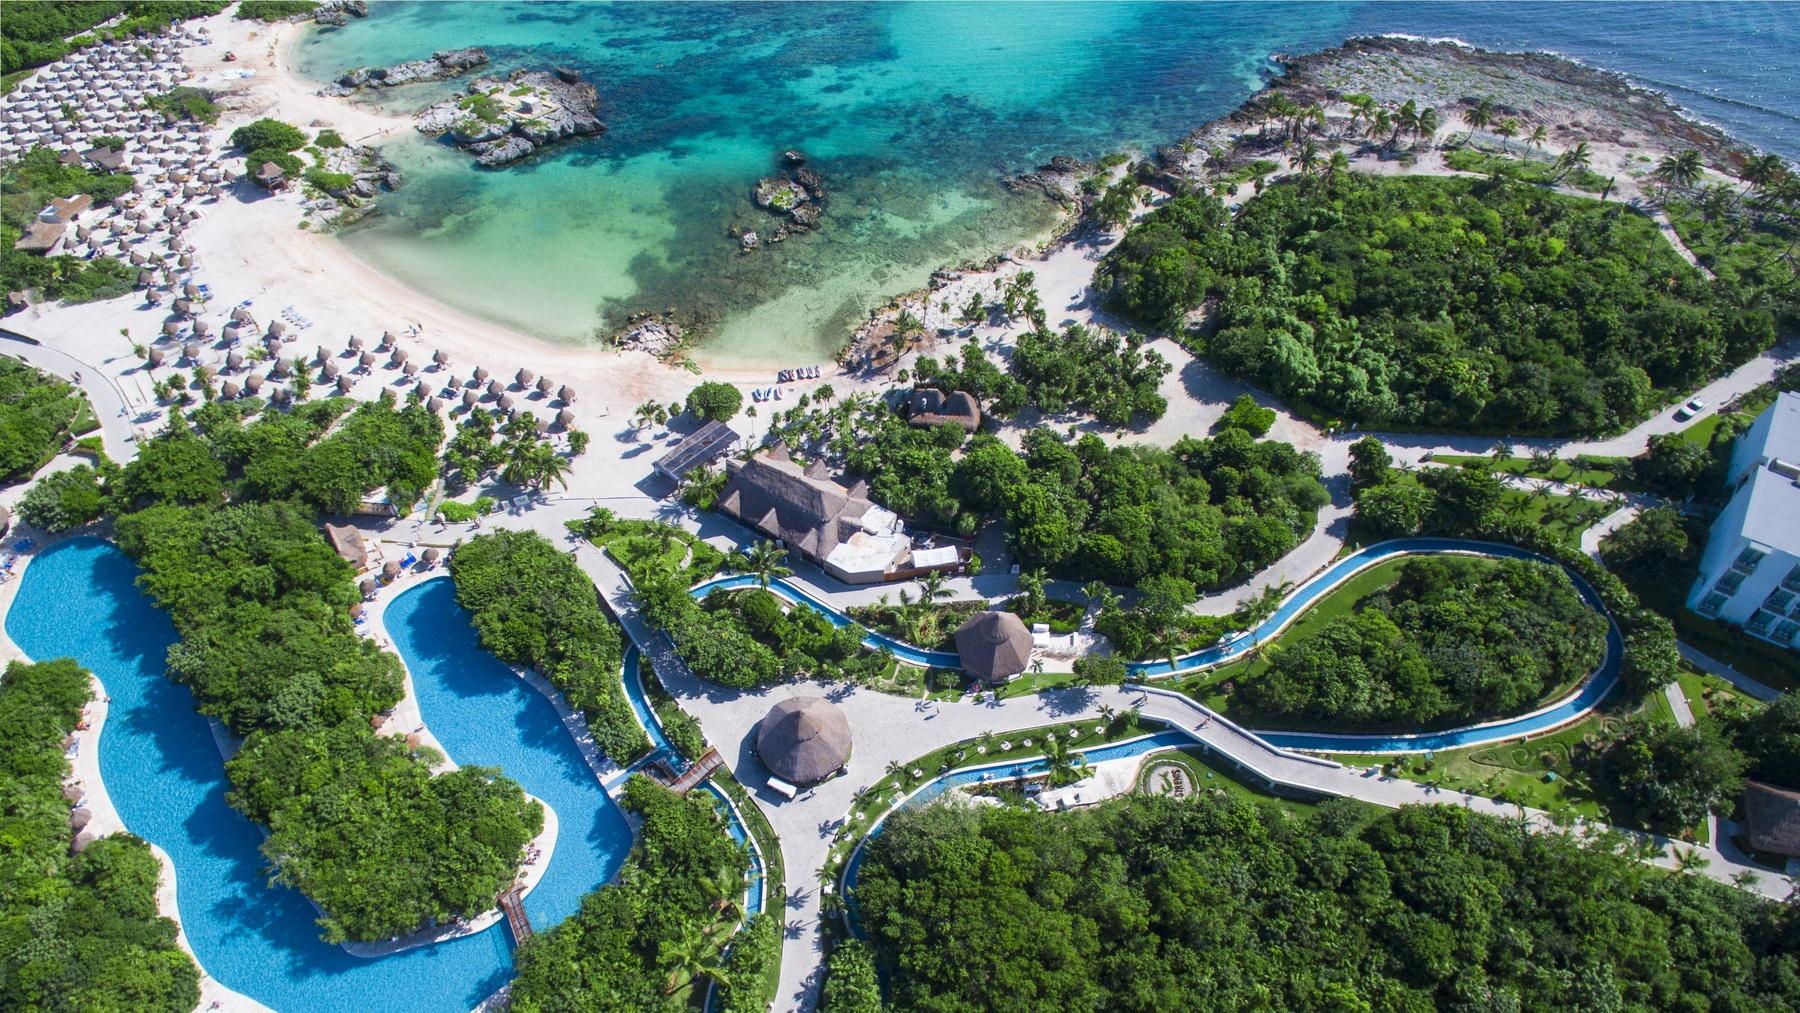 vero beach hotels map with Grand Sirenis Riviera Maya Hotel on 20272 moreover Summerland Key as well Karte von fort lauderdale region 7 512 moreover Cheap Flights To Vero Beach d6023660 additionally Disney Star Wars Resort.